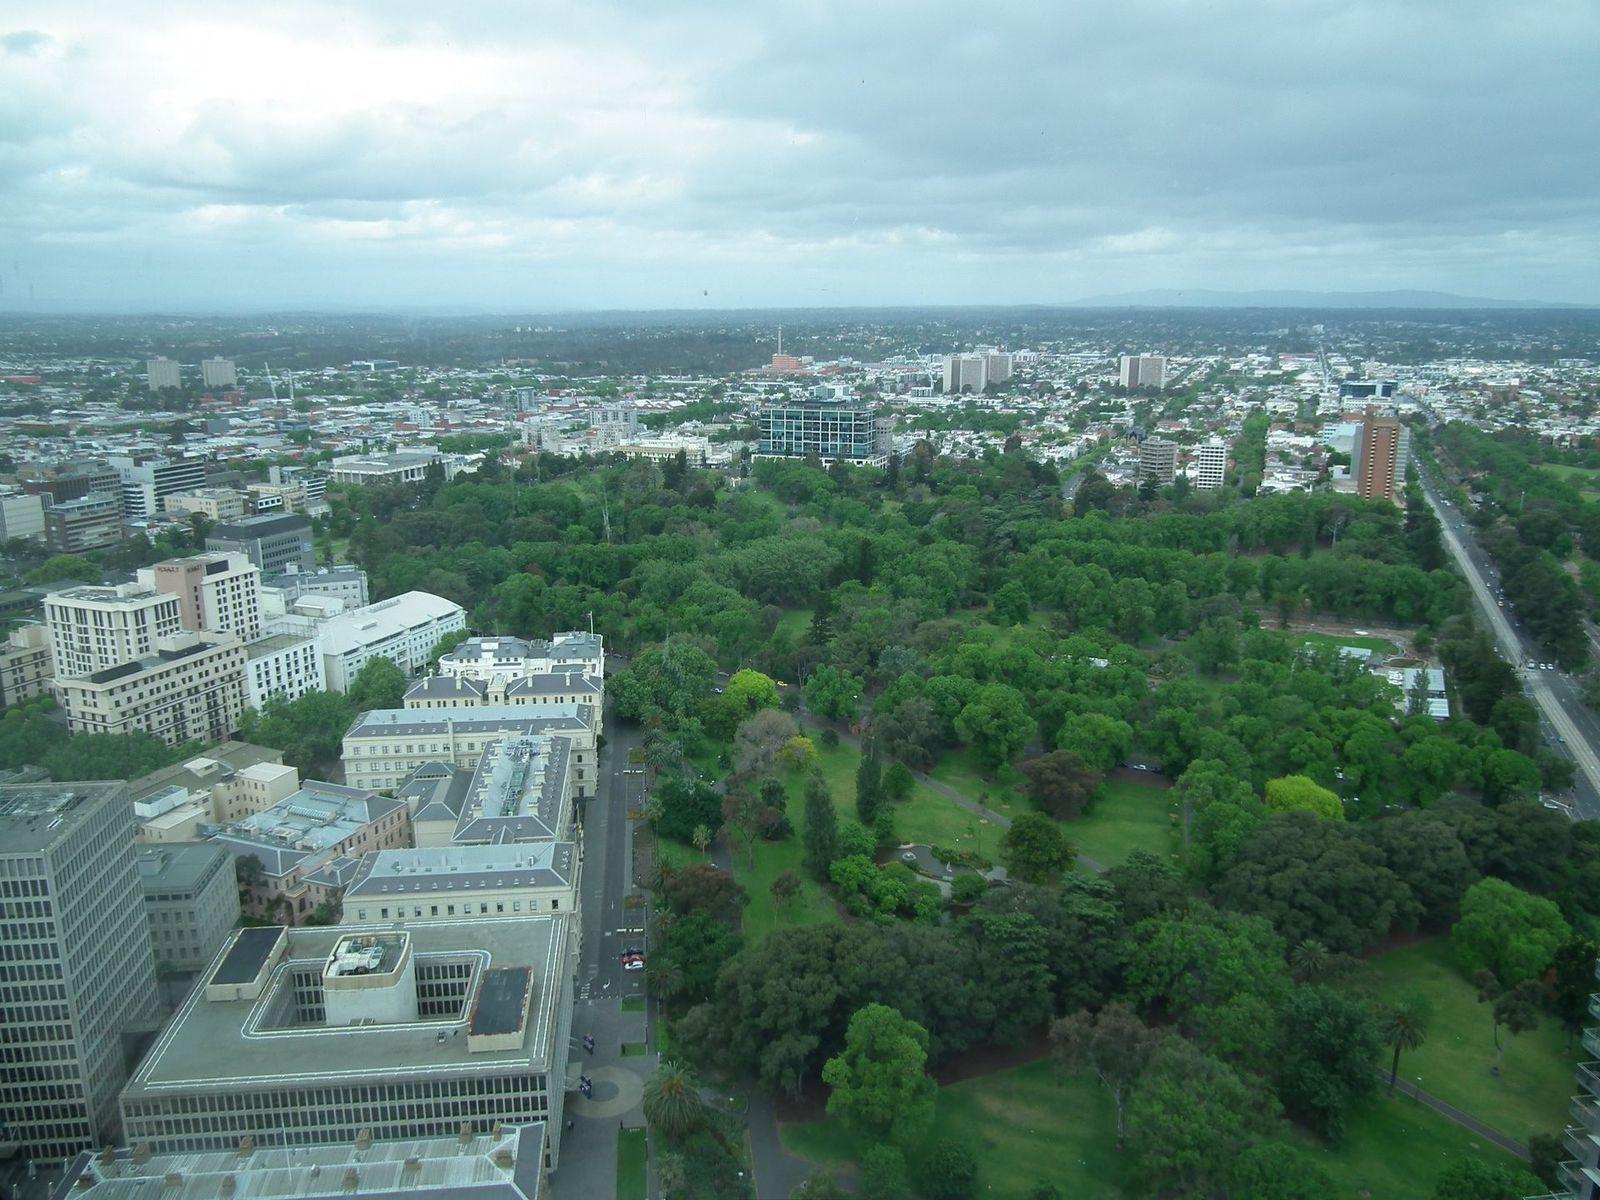 Heatcote, blue wren, fed square, view of Melbourne